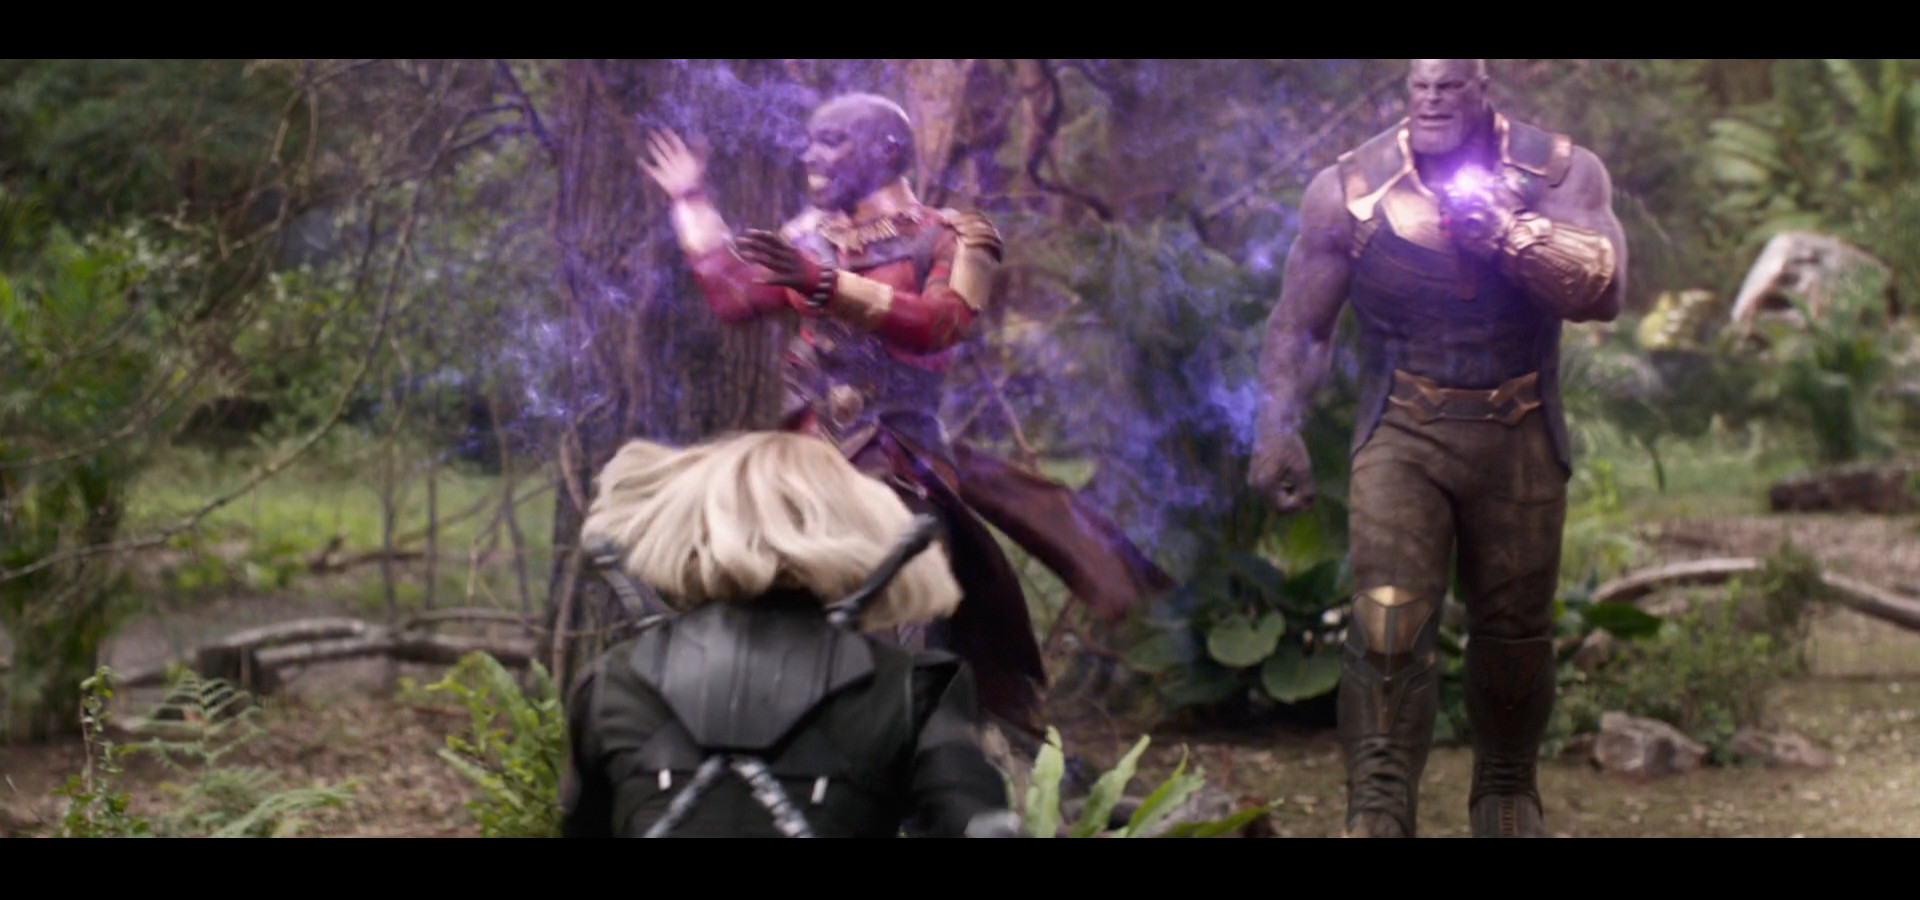 Scott knapp avengers screenshots 020